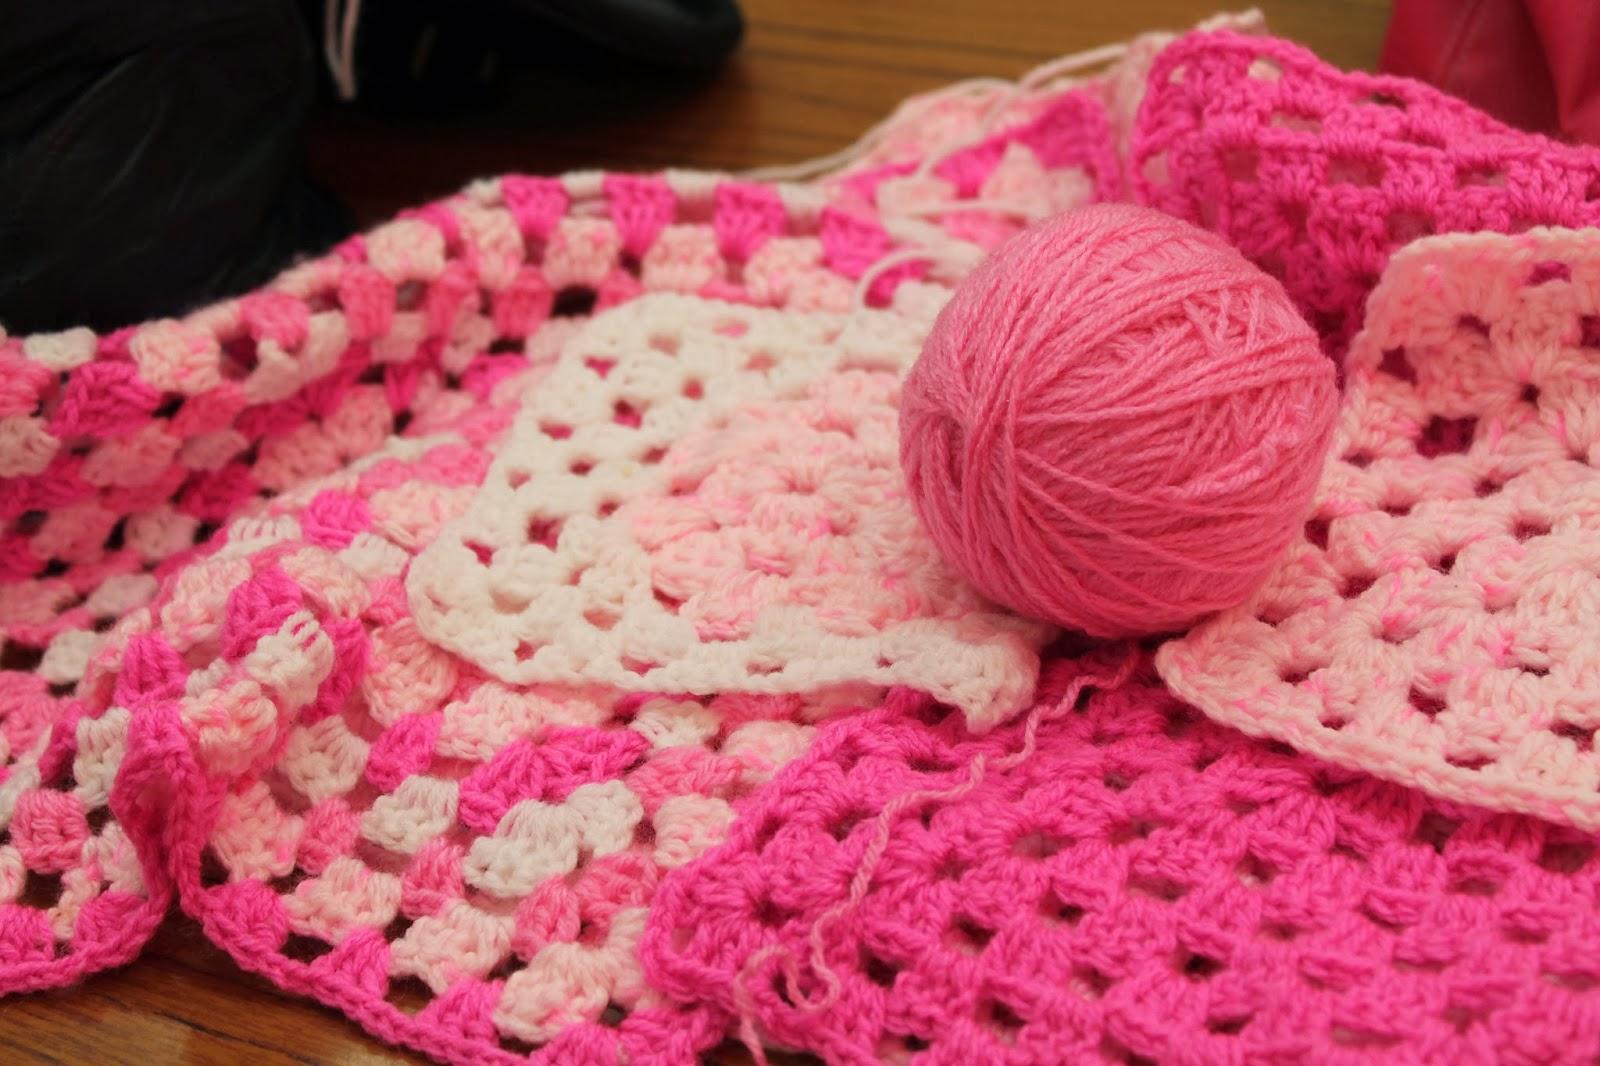 Knit Natter And Stitch New Bradwell : Knit, Natter & Stitch : Save our heritage crafts!